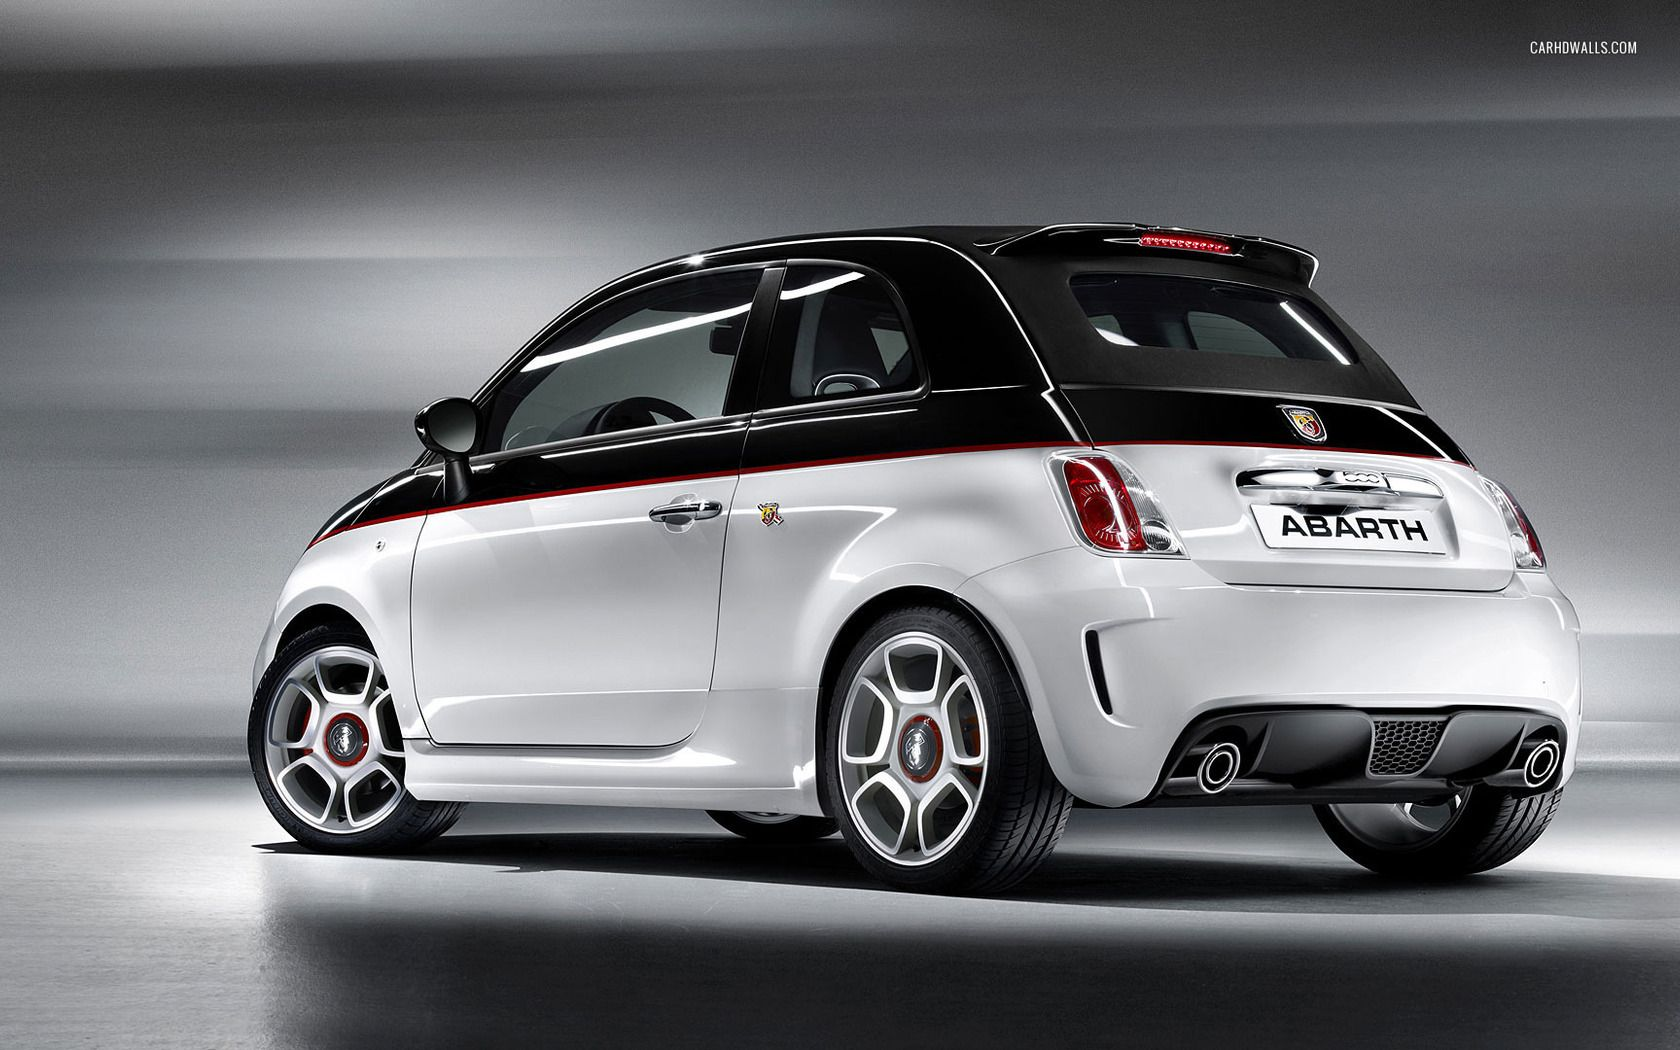 Imagini Pentru Abarth 500 Black And White Fiat 500 Carros